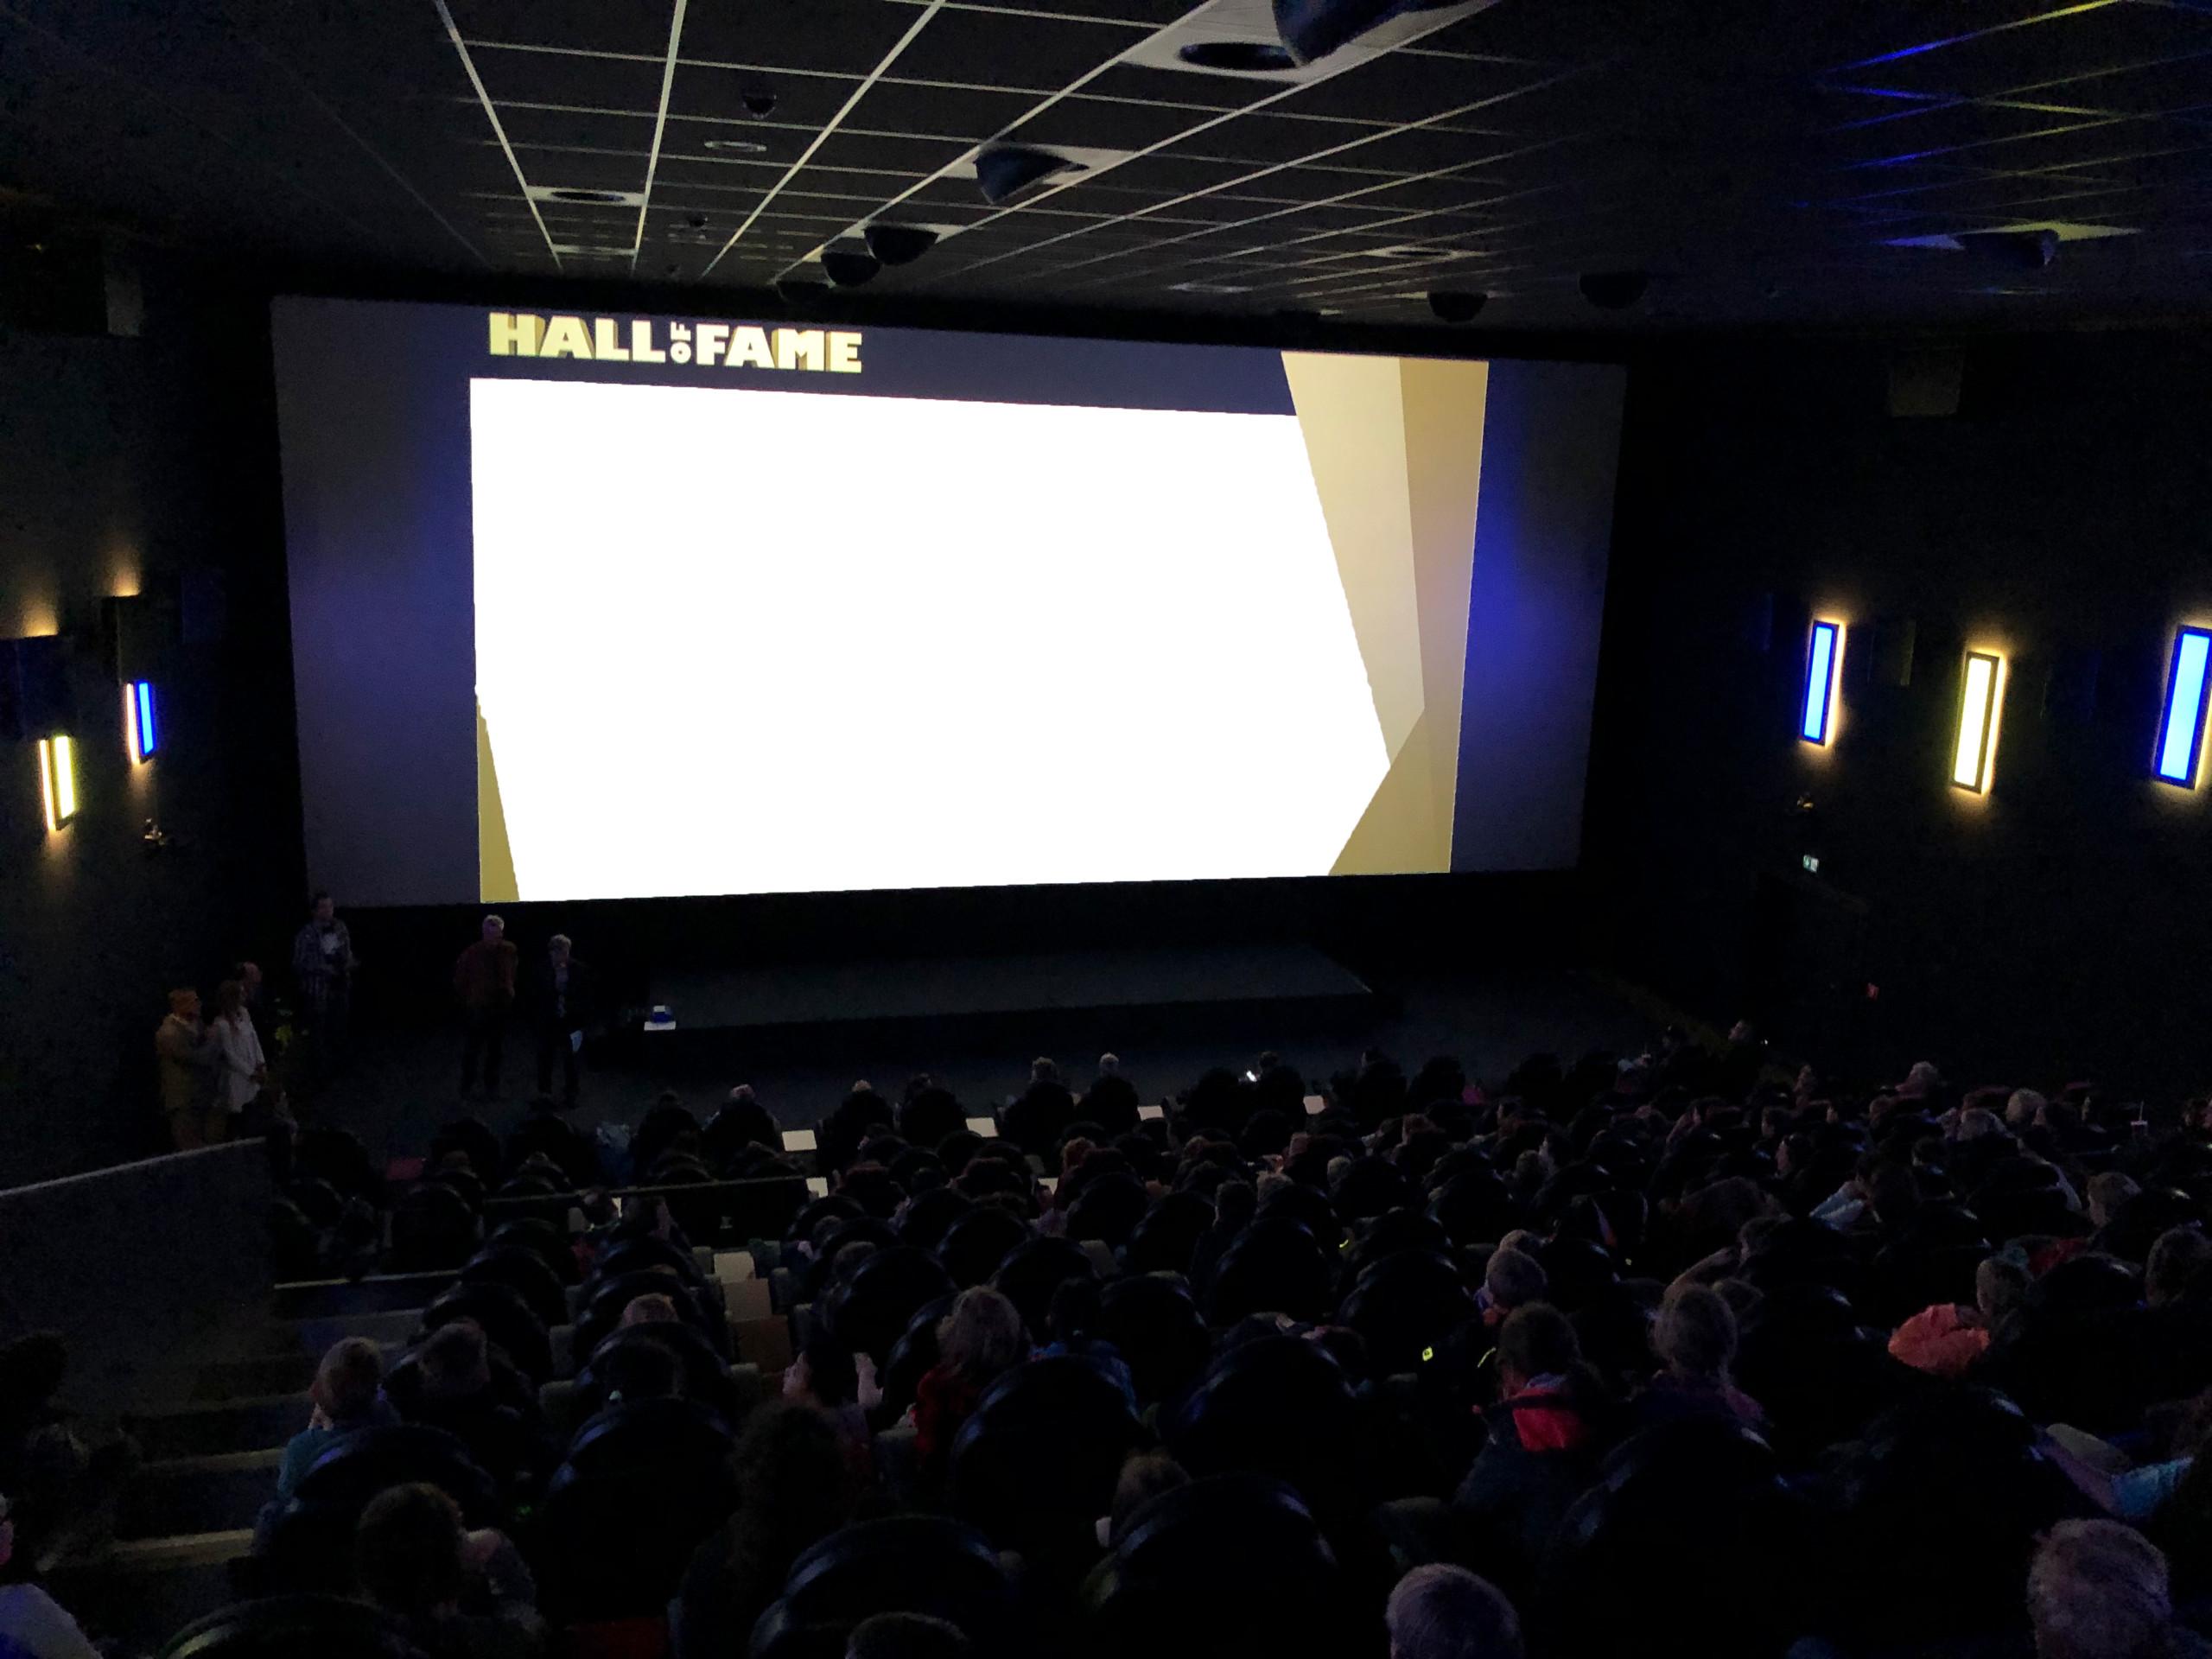 Kamp-lintfort kino